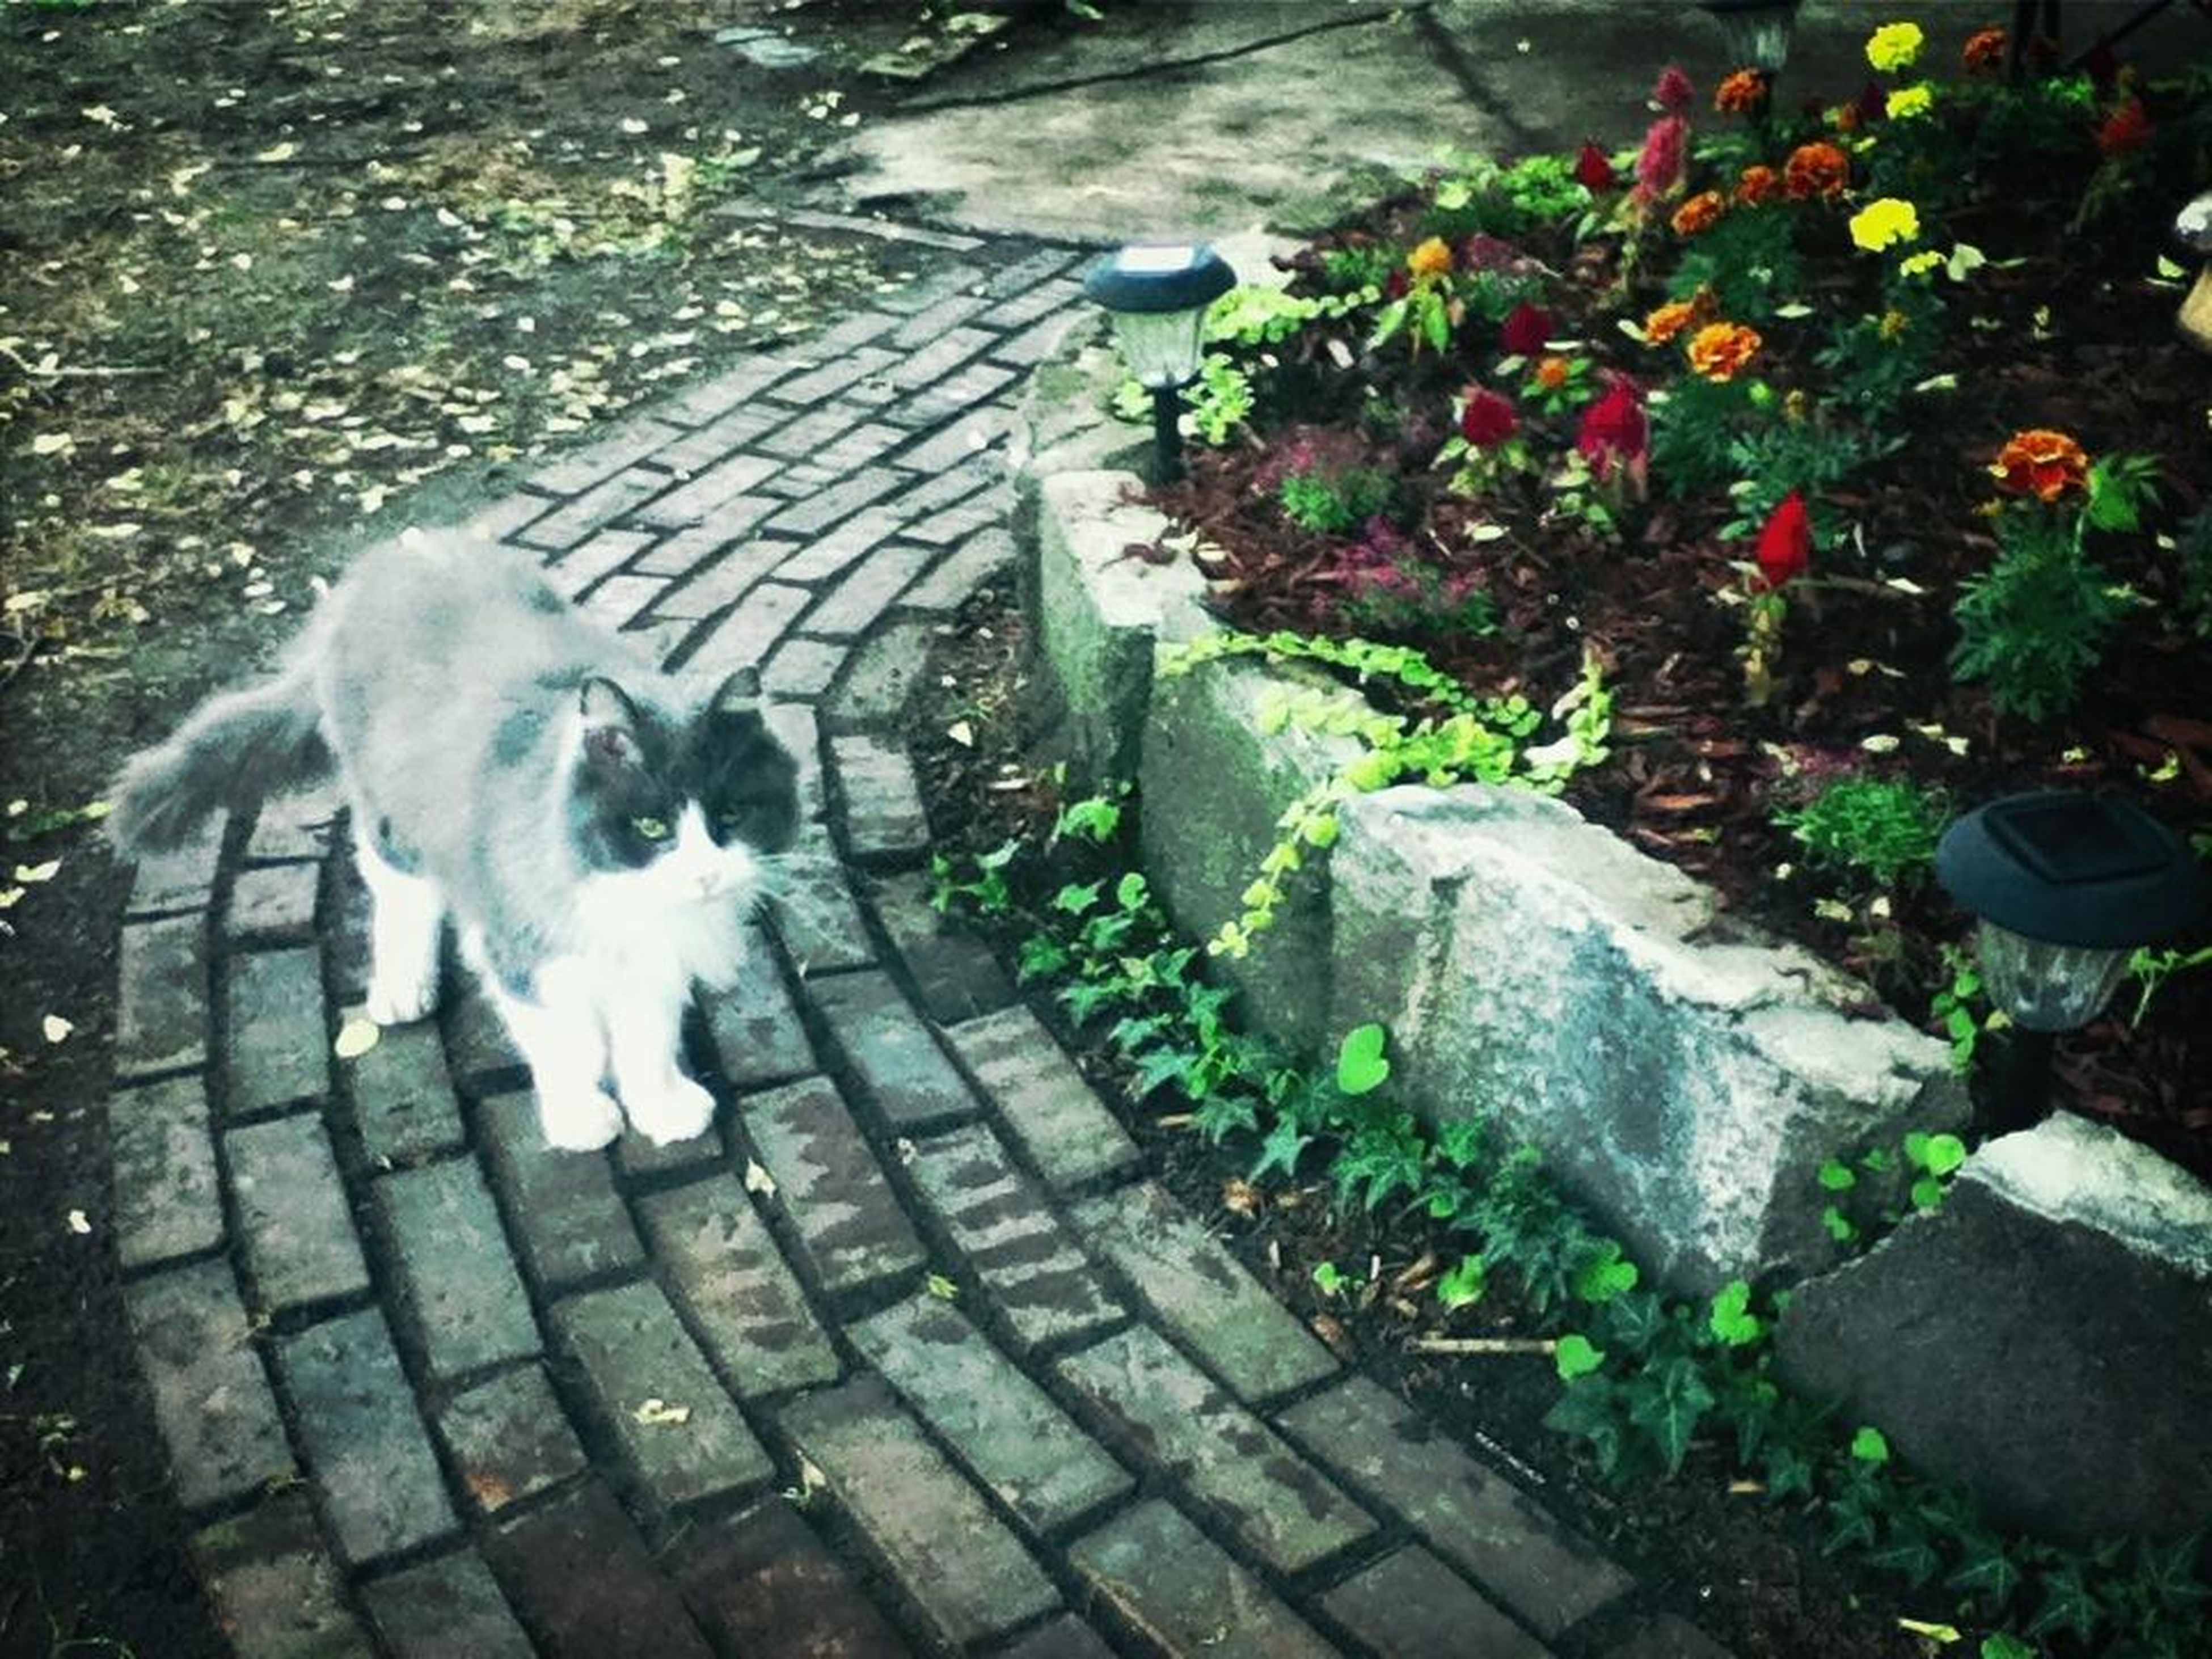 pets, domestic animals, domestic cat, mammal, high angle view, plant, cat, animal themes, one animal, leaf, footpath, steps, paving stone, outdoors, feline, dog, sidewalk, cobblestone, sunlight, day